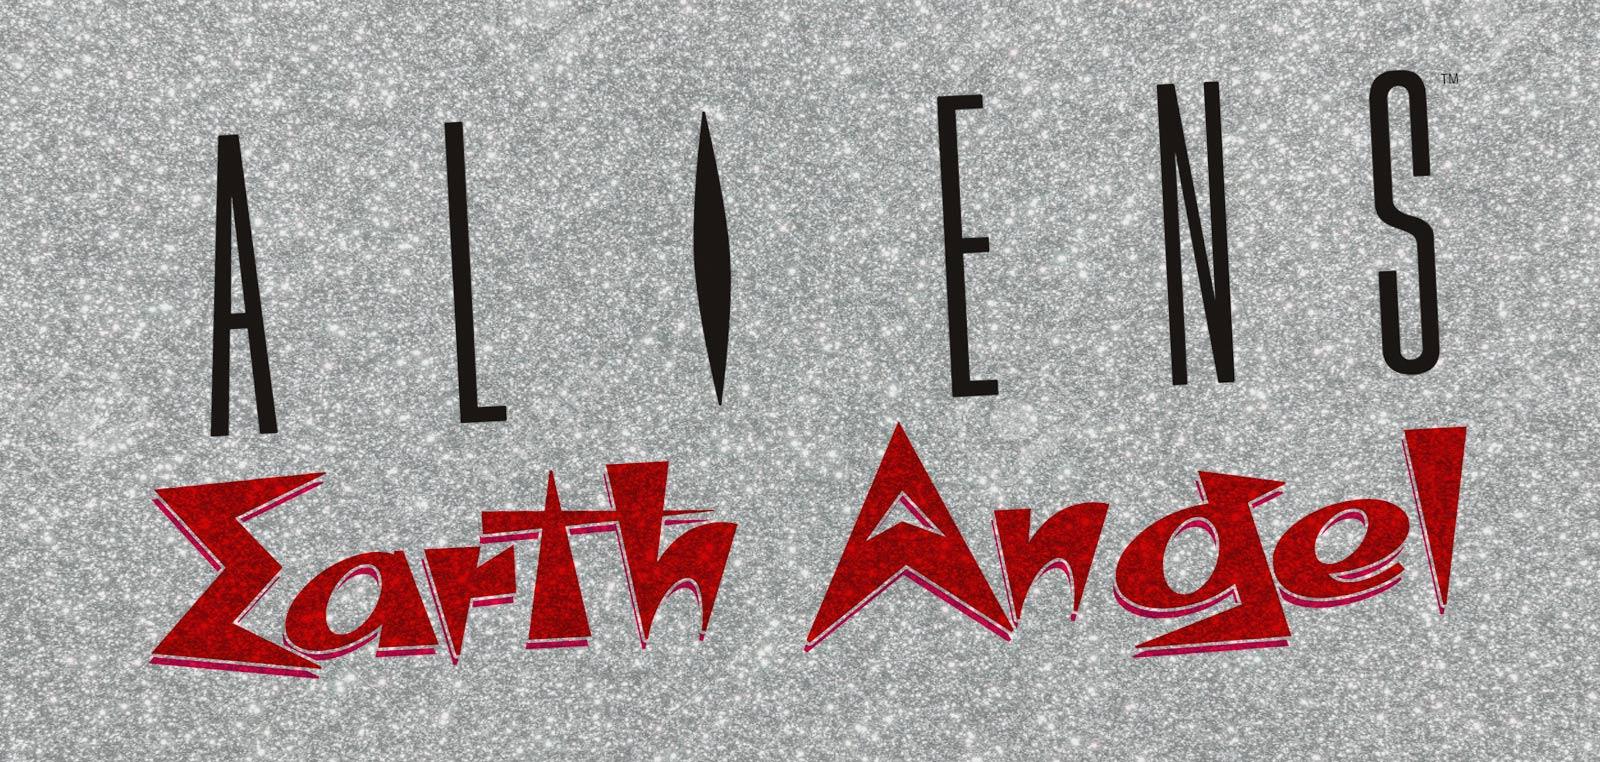 Permalink to: RAW : John Byrne, Aliens Earth Angel